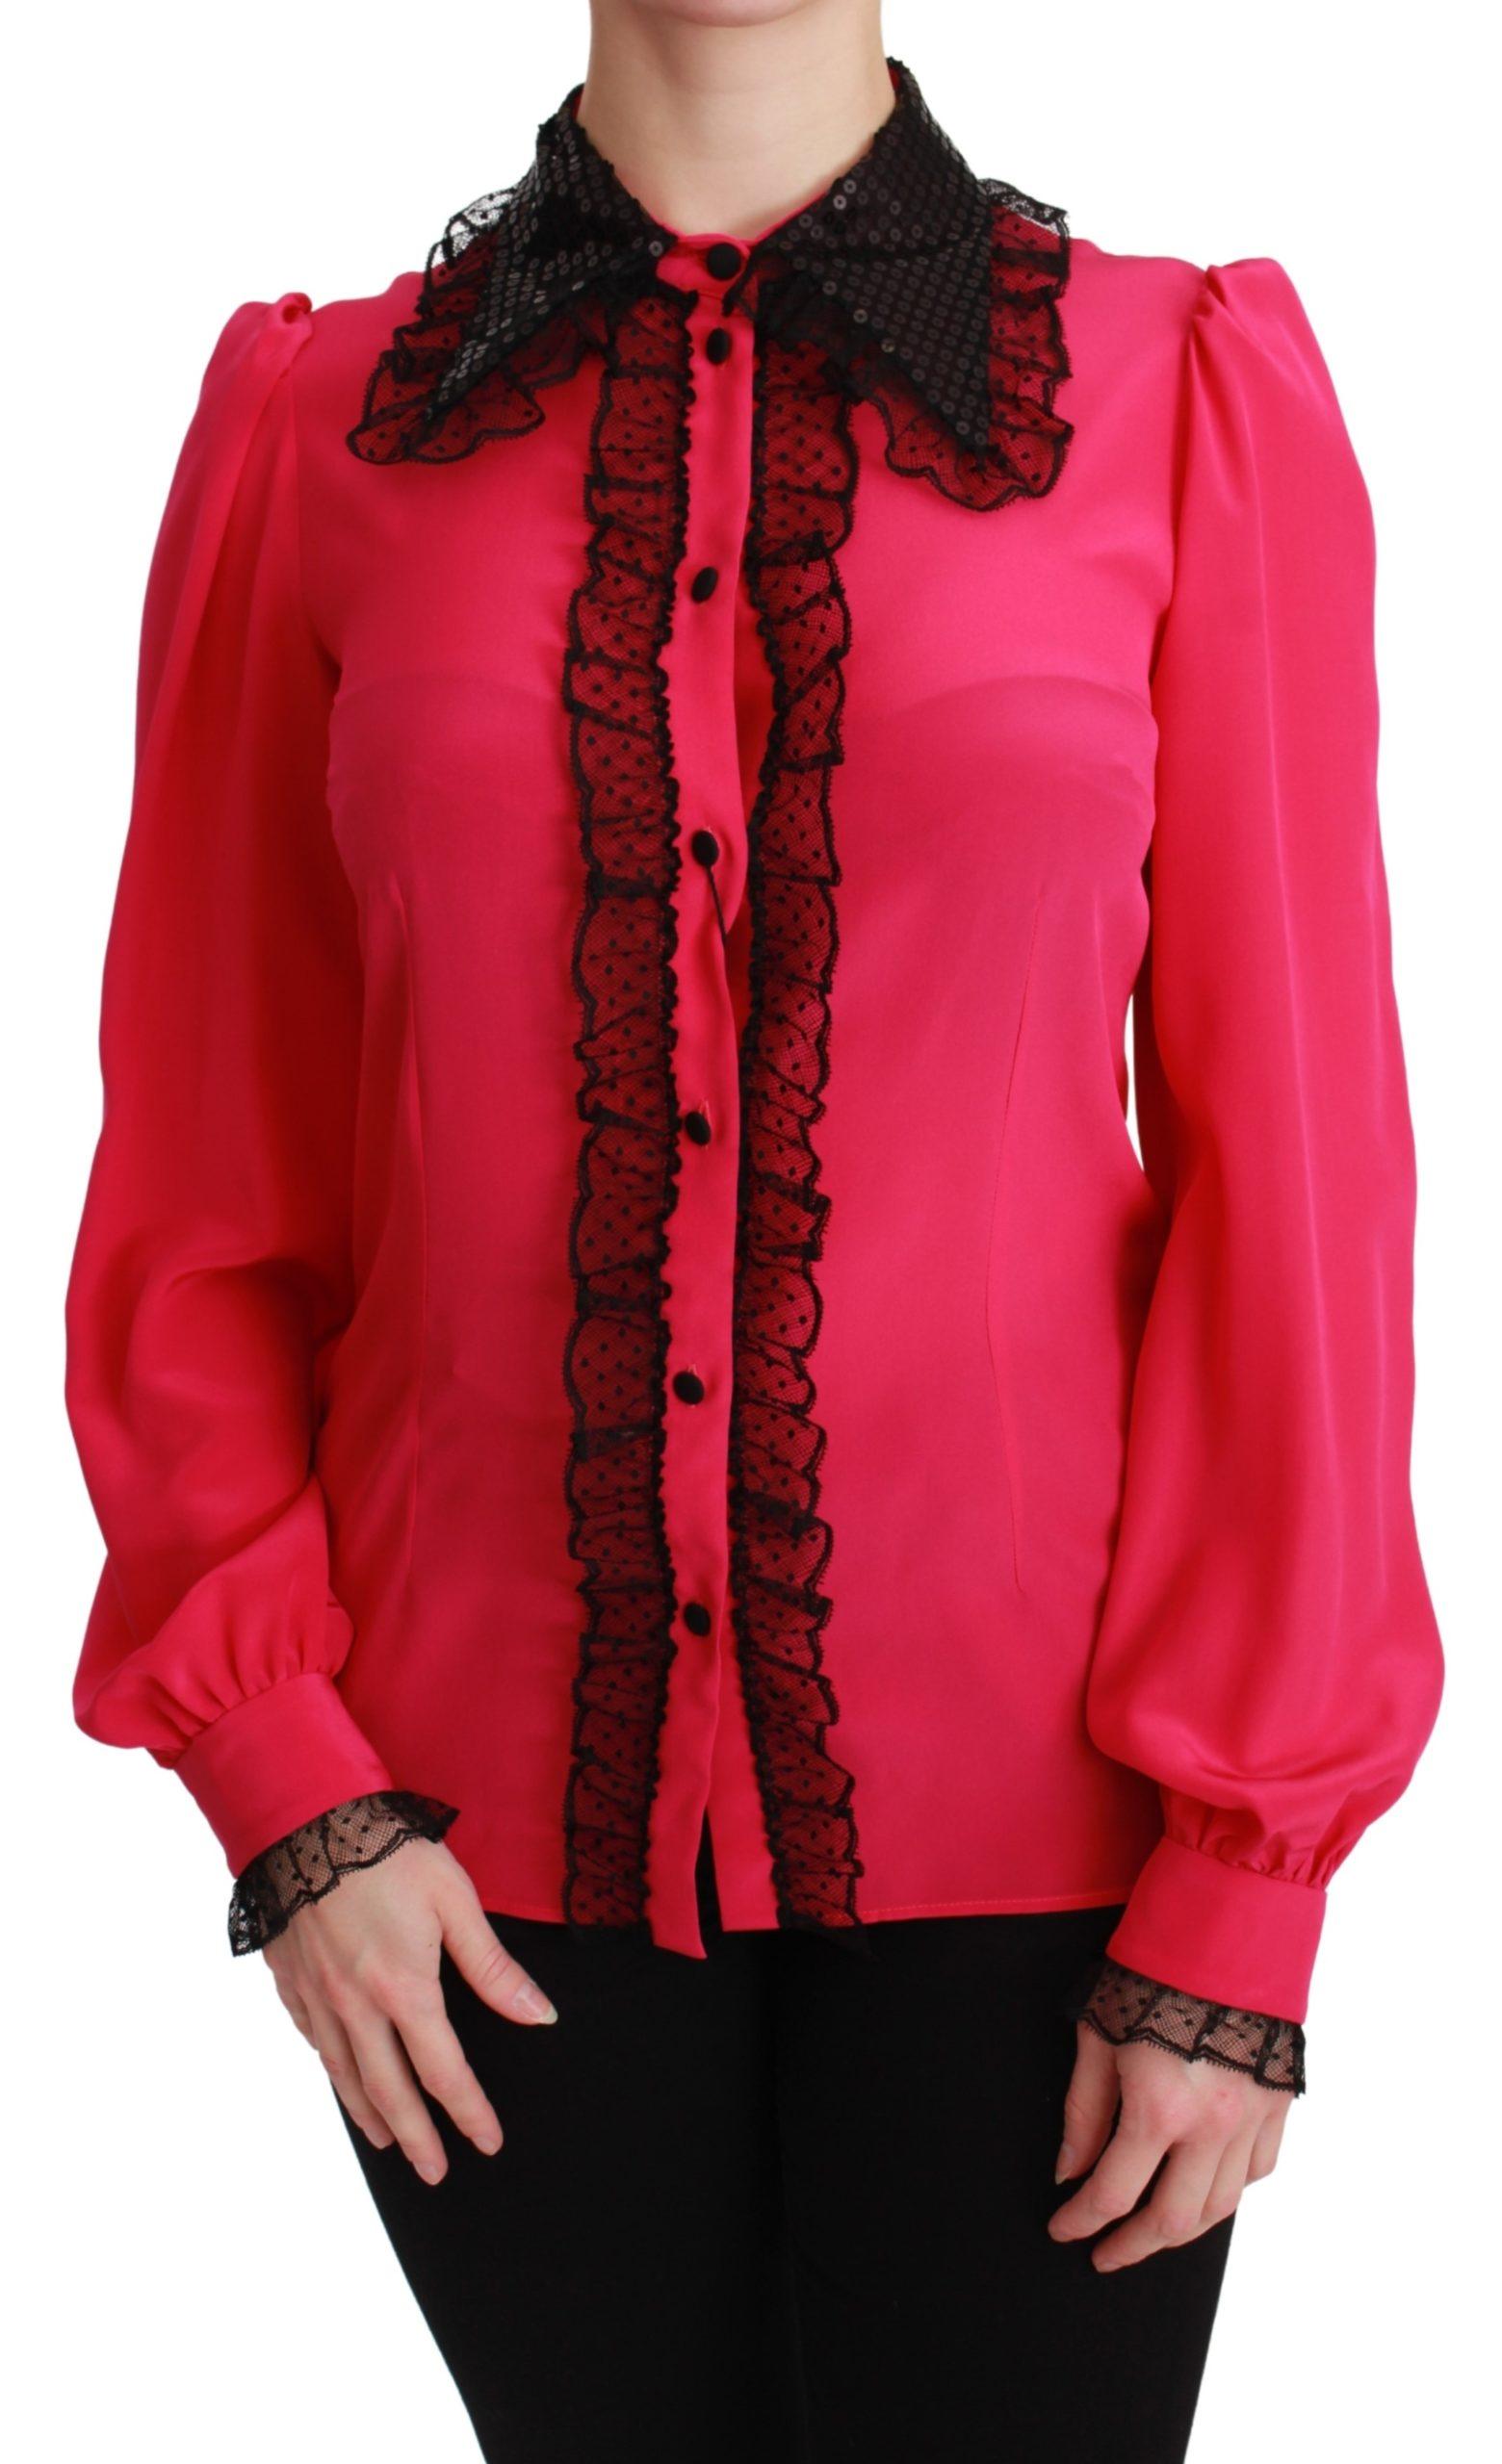 Dolce & Gabbana Women's Silk Sequin Lace Shirt Pink TSH2673 - IT38 XS